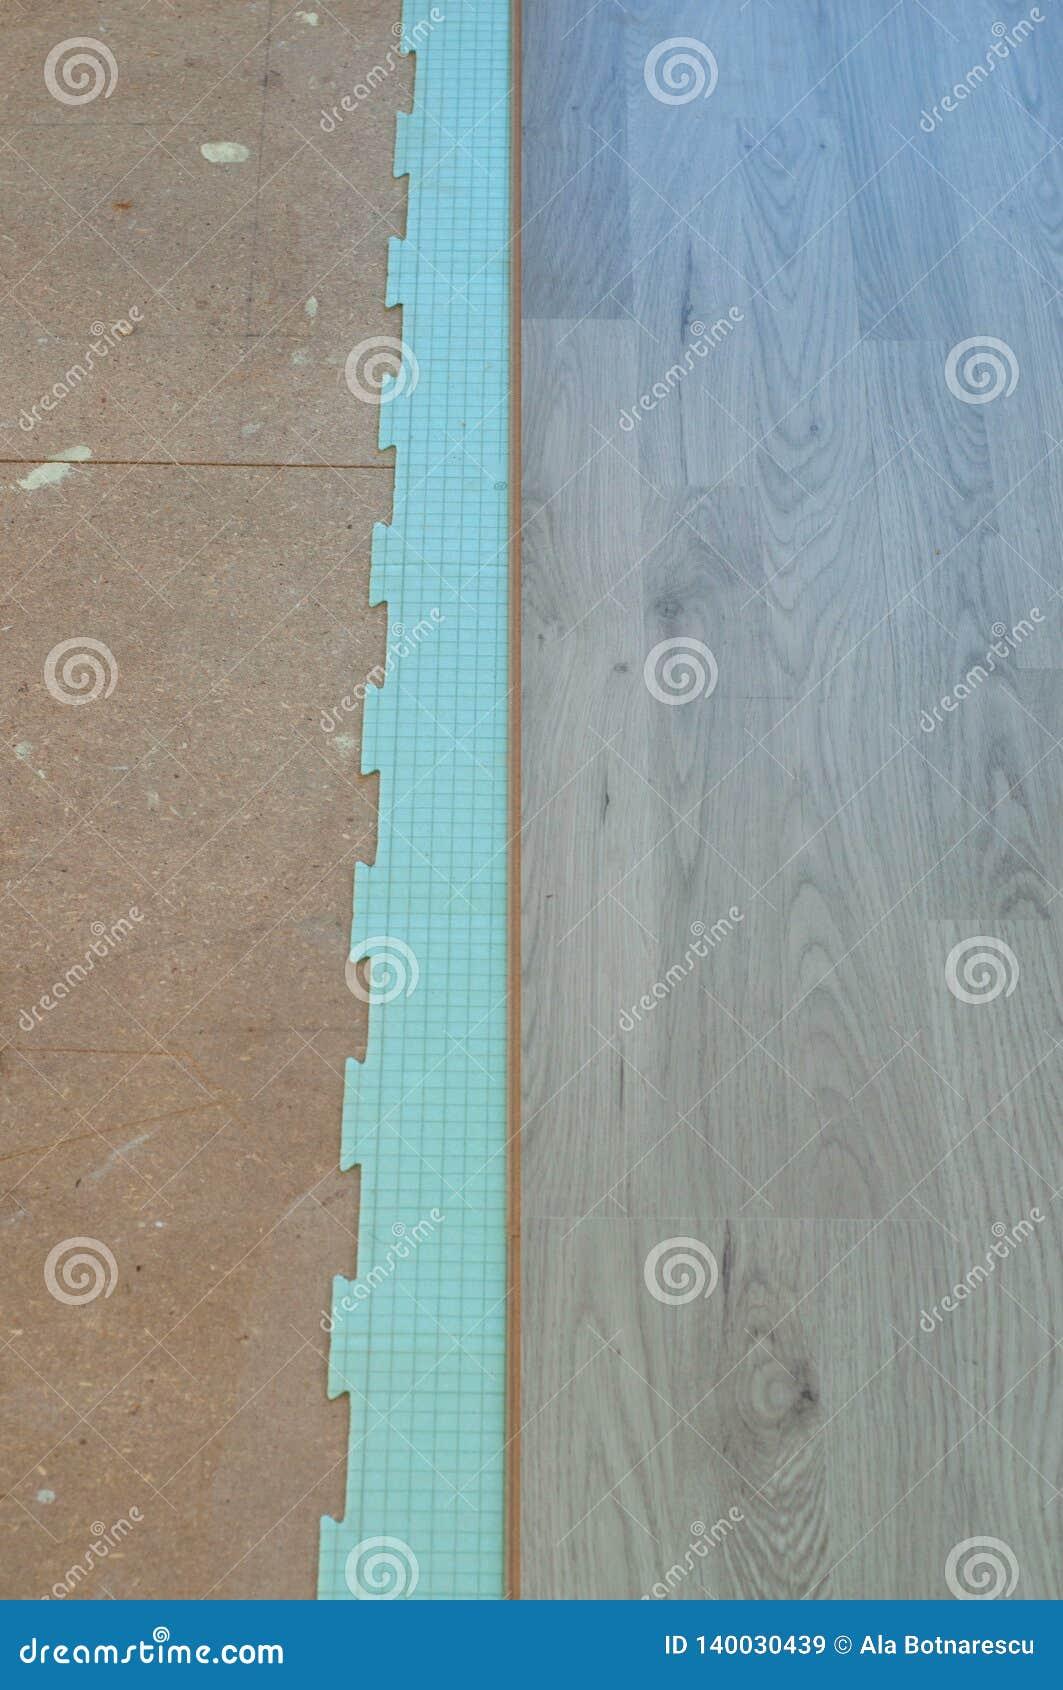 Istalation του νέου φυλλόμορφου δαπέδου, που χρησιμοποιεί ένα υγιές υλικό απομόνωσης